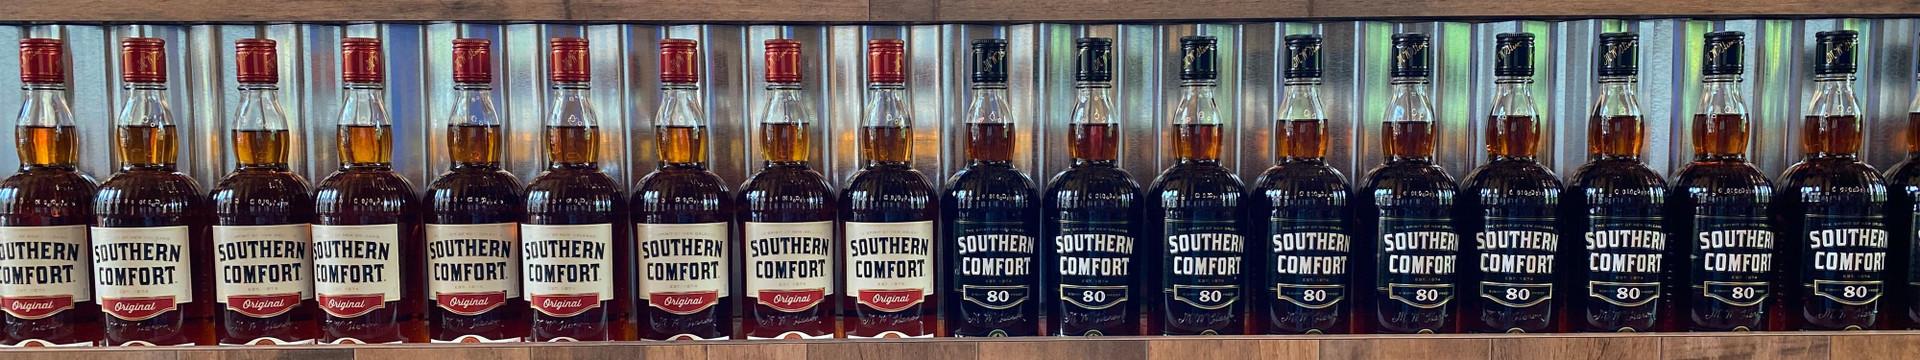 Southern Comfort | Comfort Food Gatlinburg